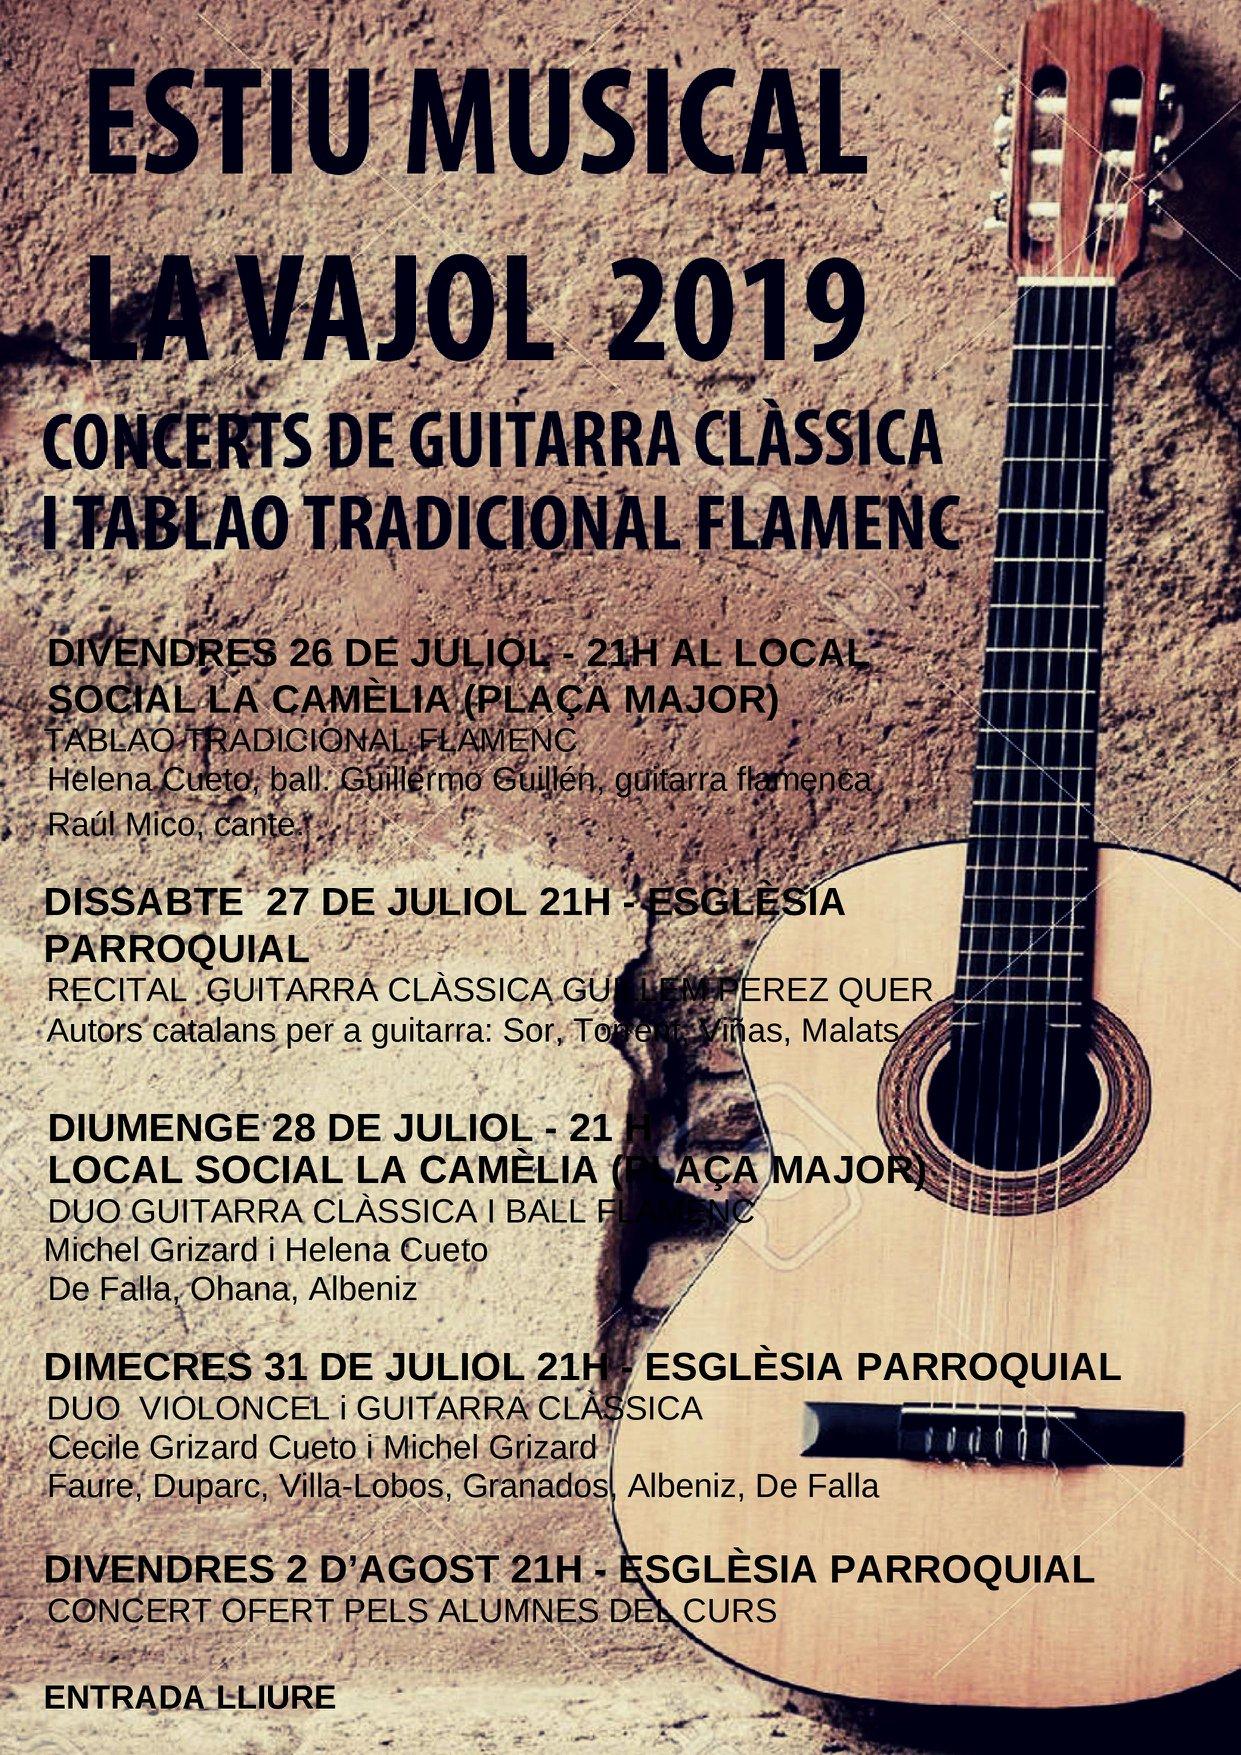 Estiu Musical La Vajol 2019 affiche